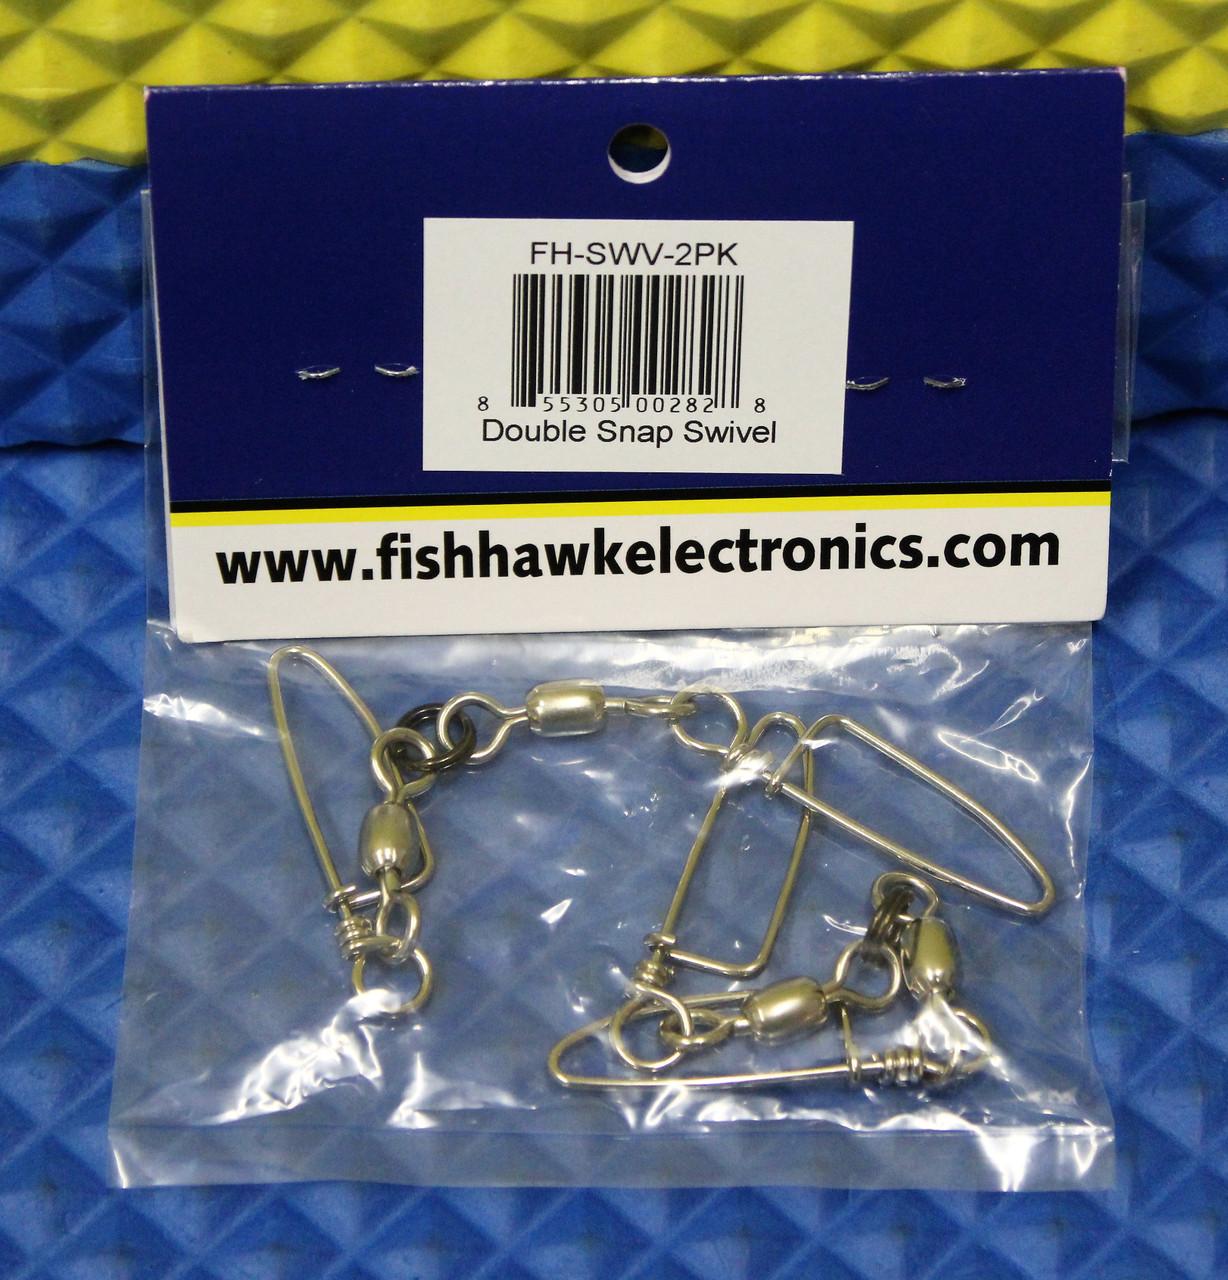 FISH HAWK ELECTRONICS DOUBLE SNAP SWIVEL FH-SWV-2PK